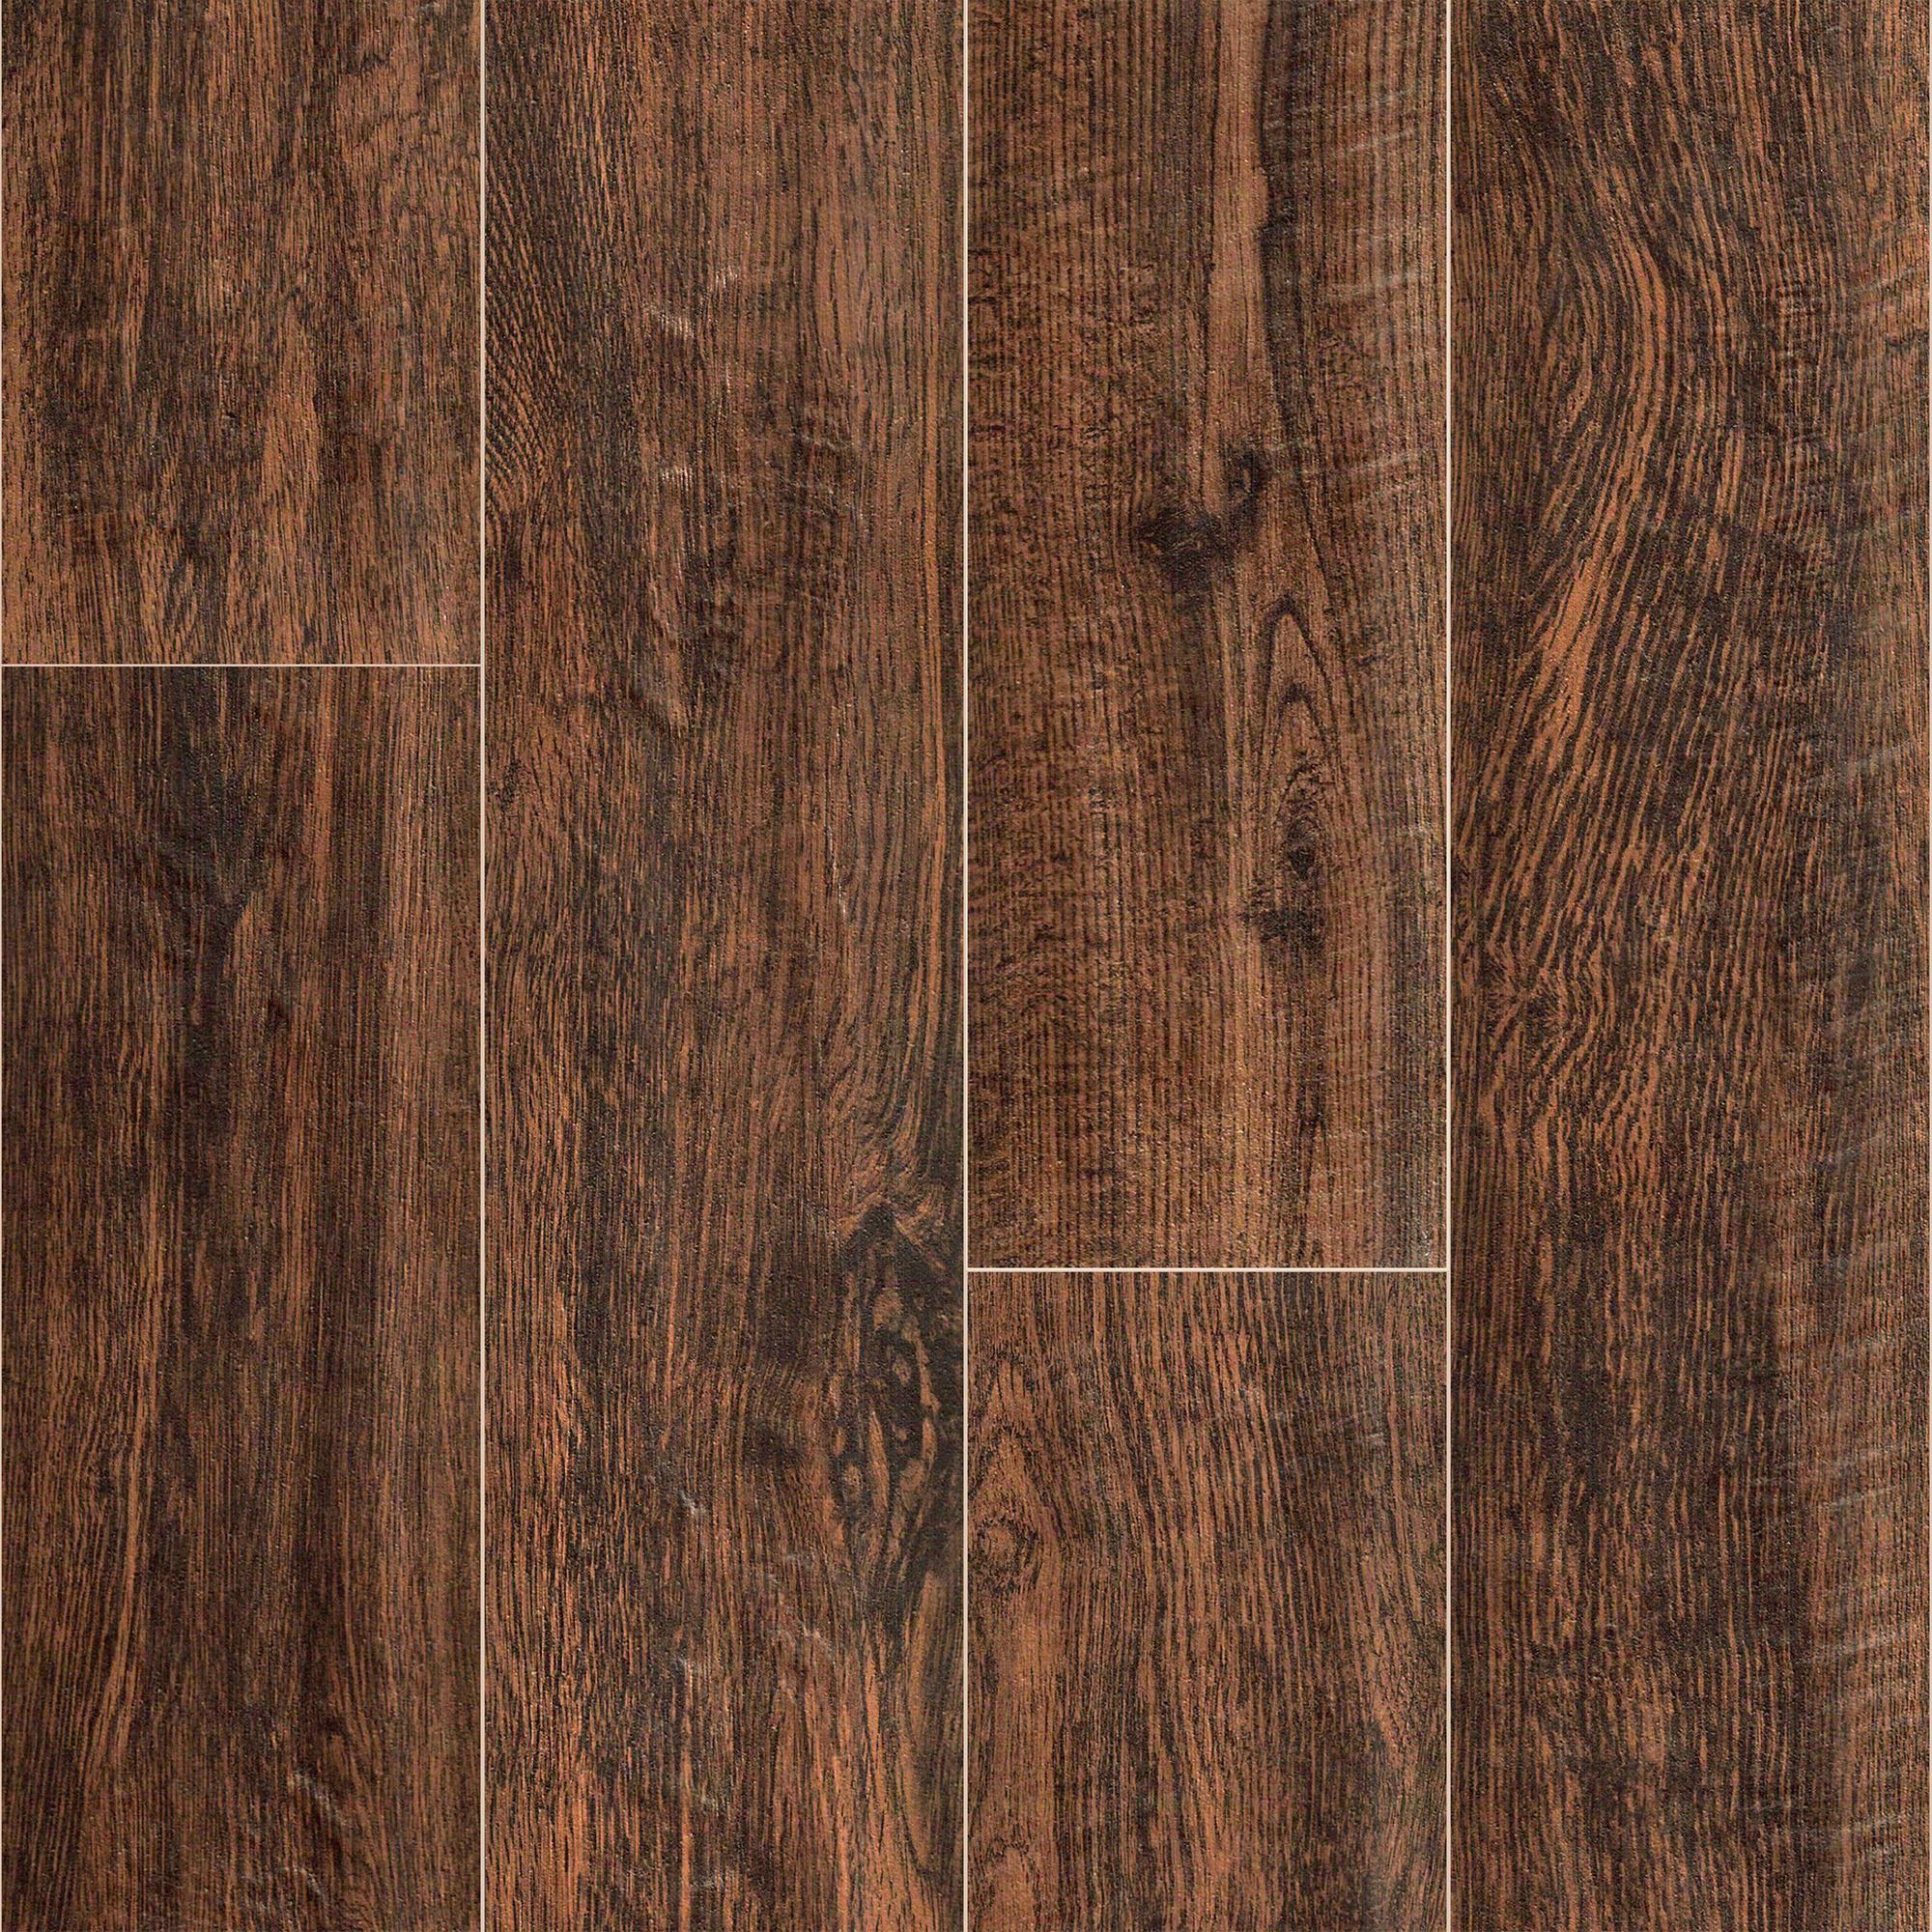 Marazzi American Estates Spice Wood Plank Porcelain Tile 6x36 Ulcf